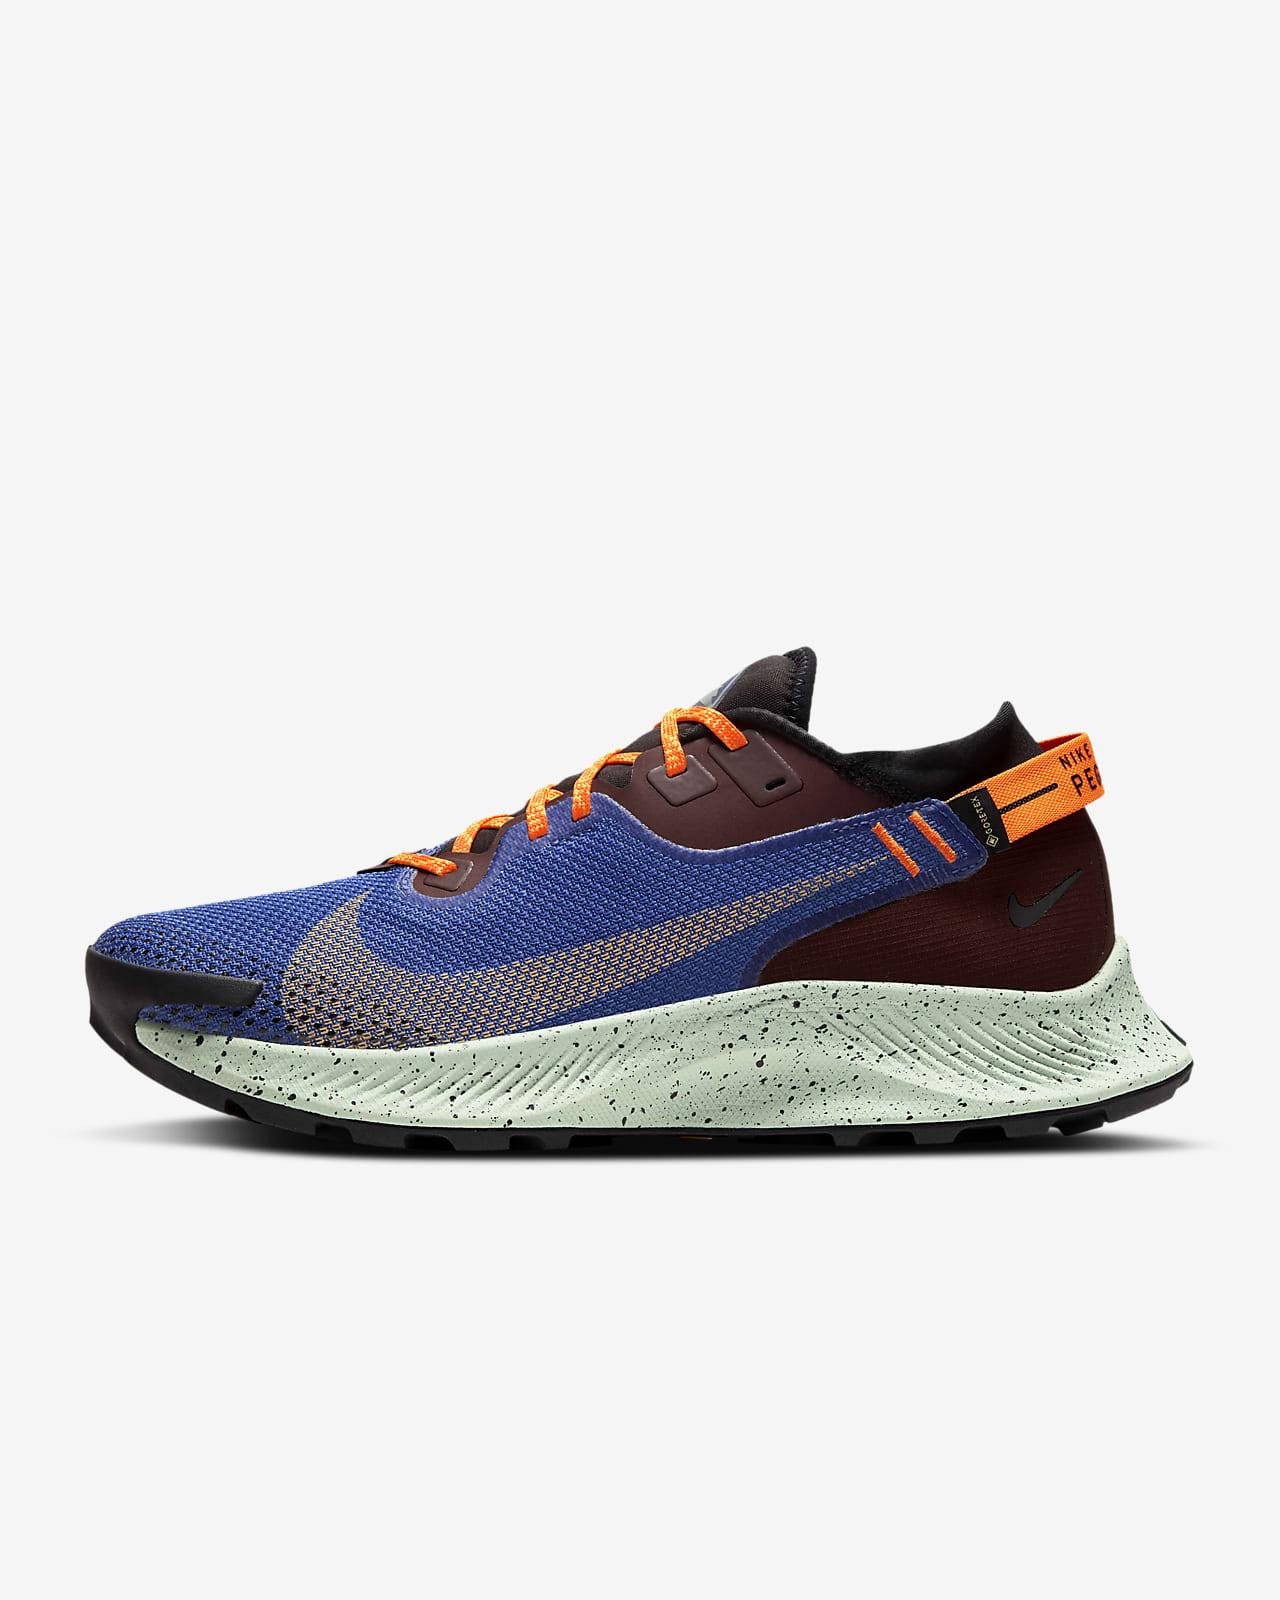 Pánská běžecká trailová bota Nike Pegasus Trail 2 GORE-TEX